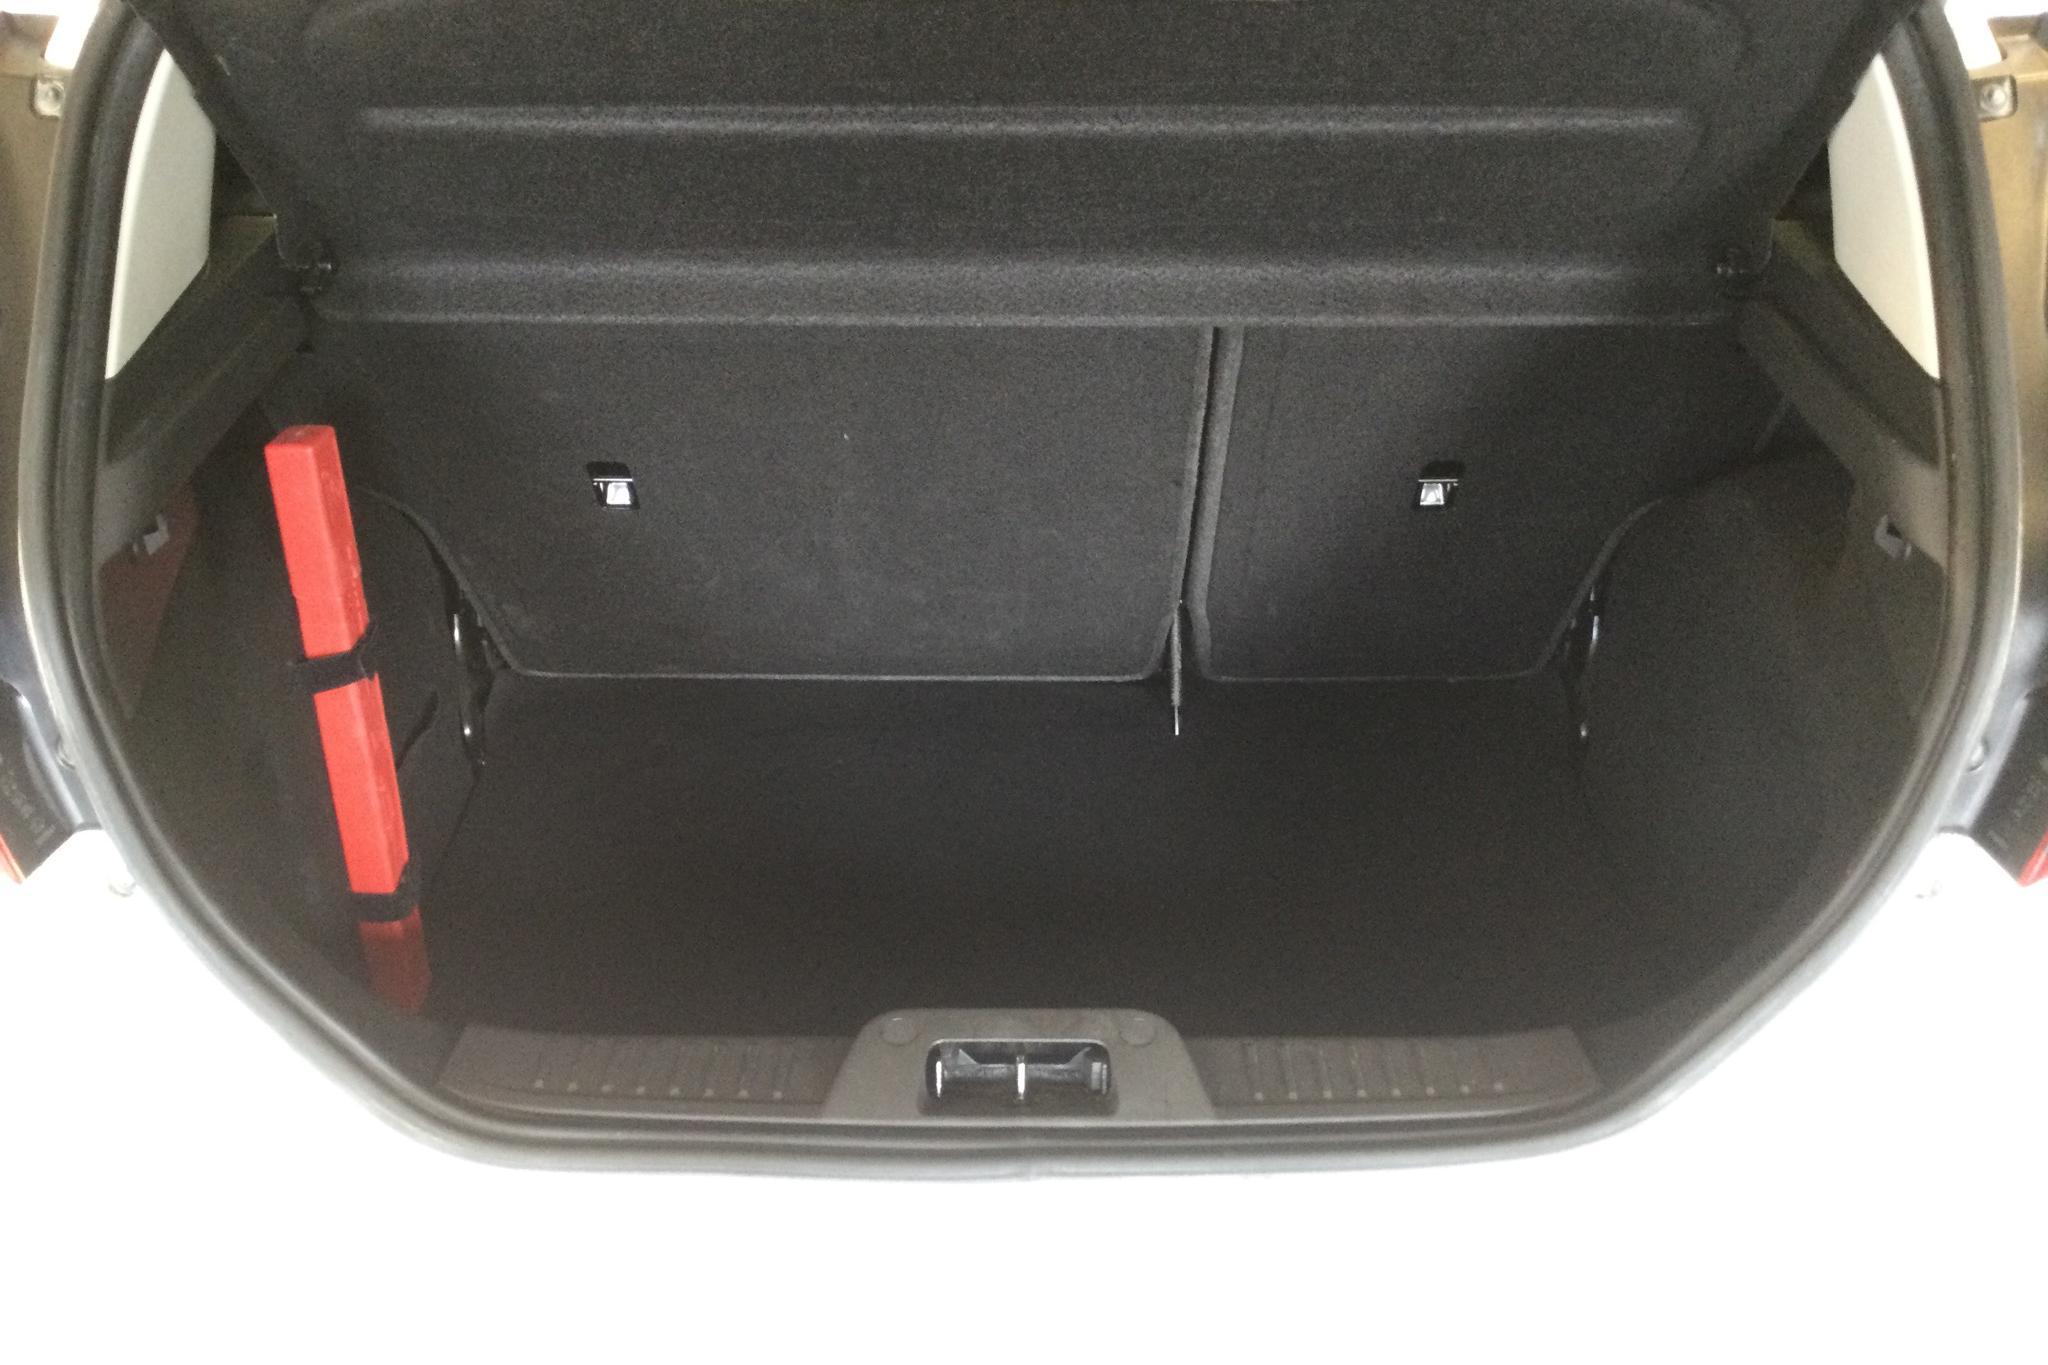 Ford Fiesta 1.5 TDCi Econetic 5dr (95hk) - 14 988 mil - Manuell - vit - 2017